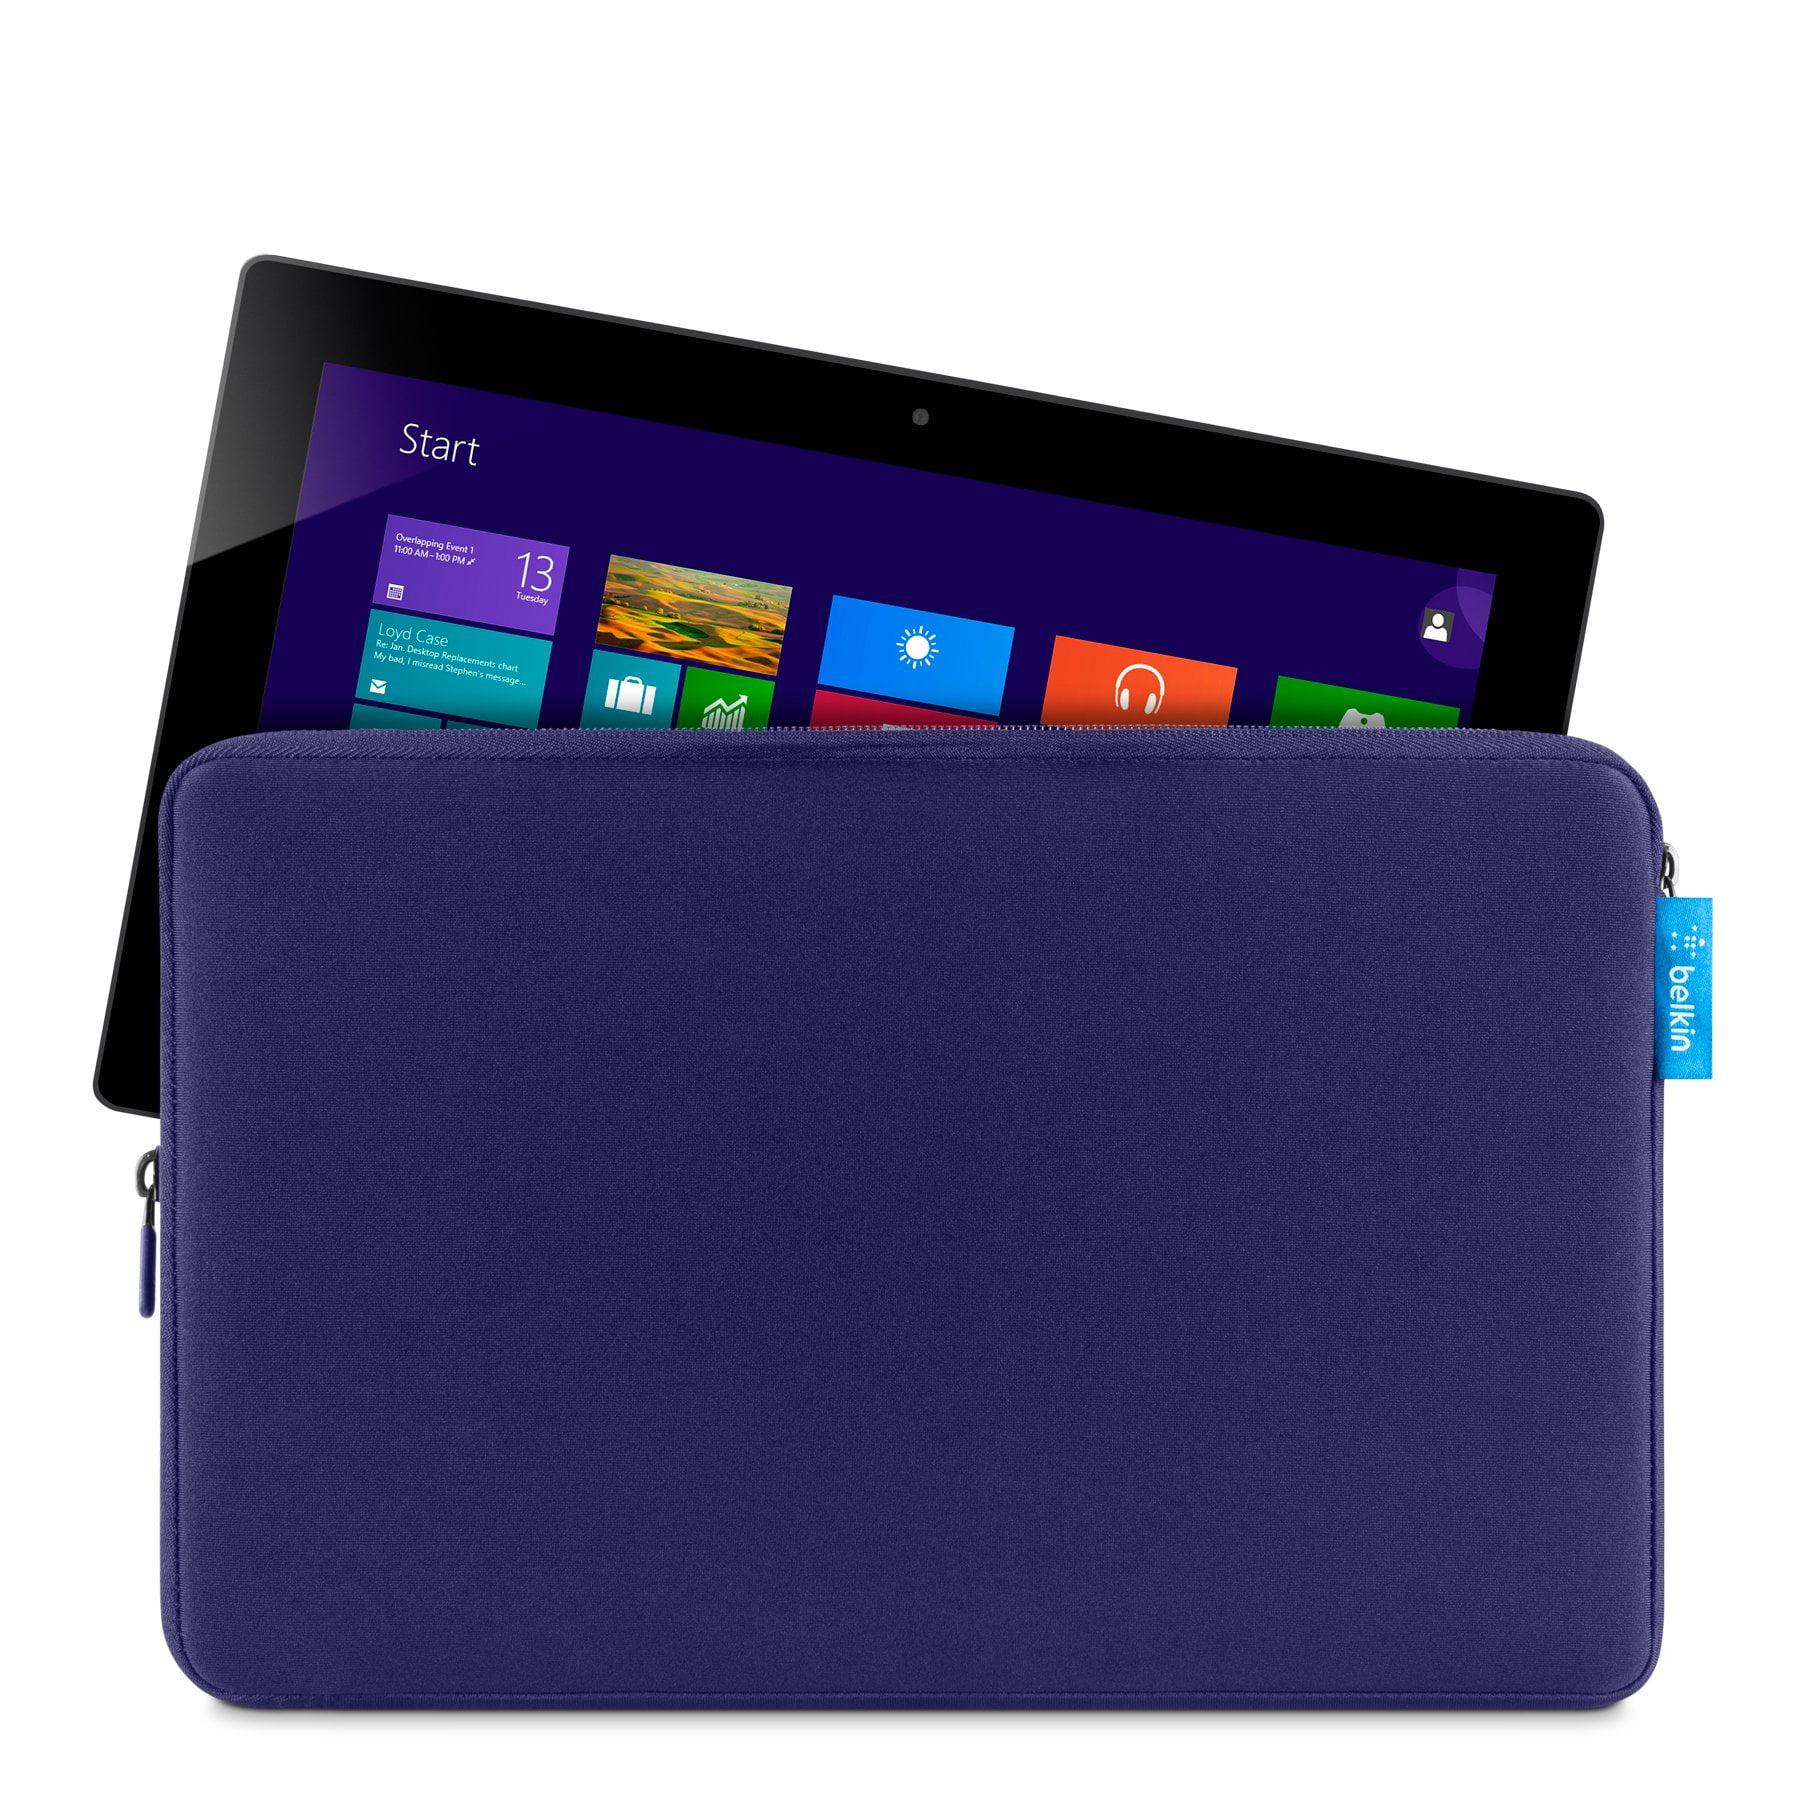 Belkin Carrying Case [sleeve] For Tablet - Navy - Scratch Resistant Interior, Damage Resistant Interior - Neoprene (f7p306ttc03)